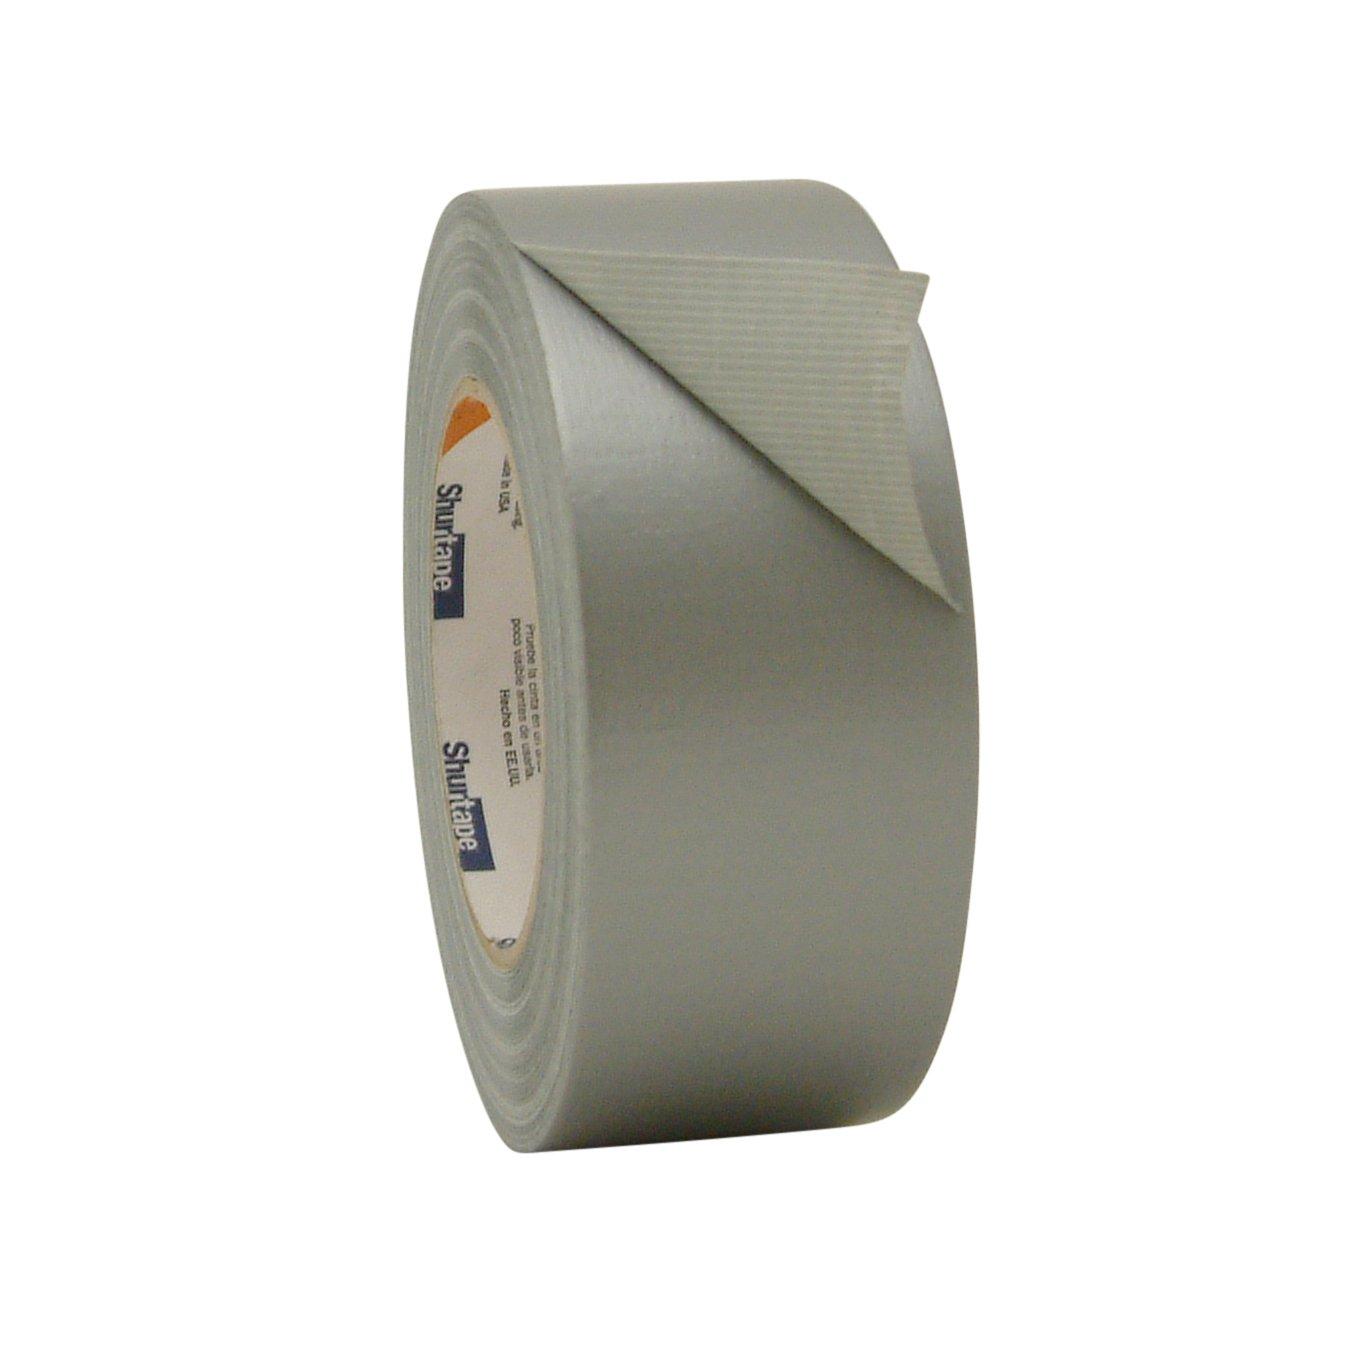 AGN 120954 Shurtape PC-460 Economy-Grade Grade Duct Tape: 2'' x 60 yd, Silver